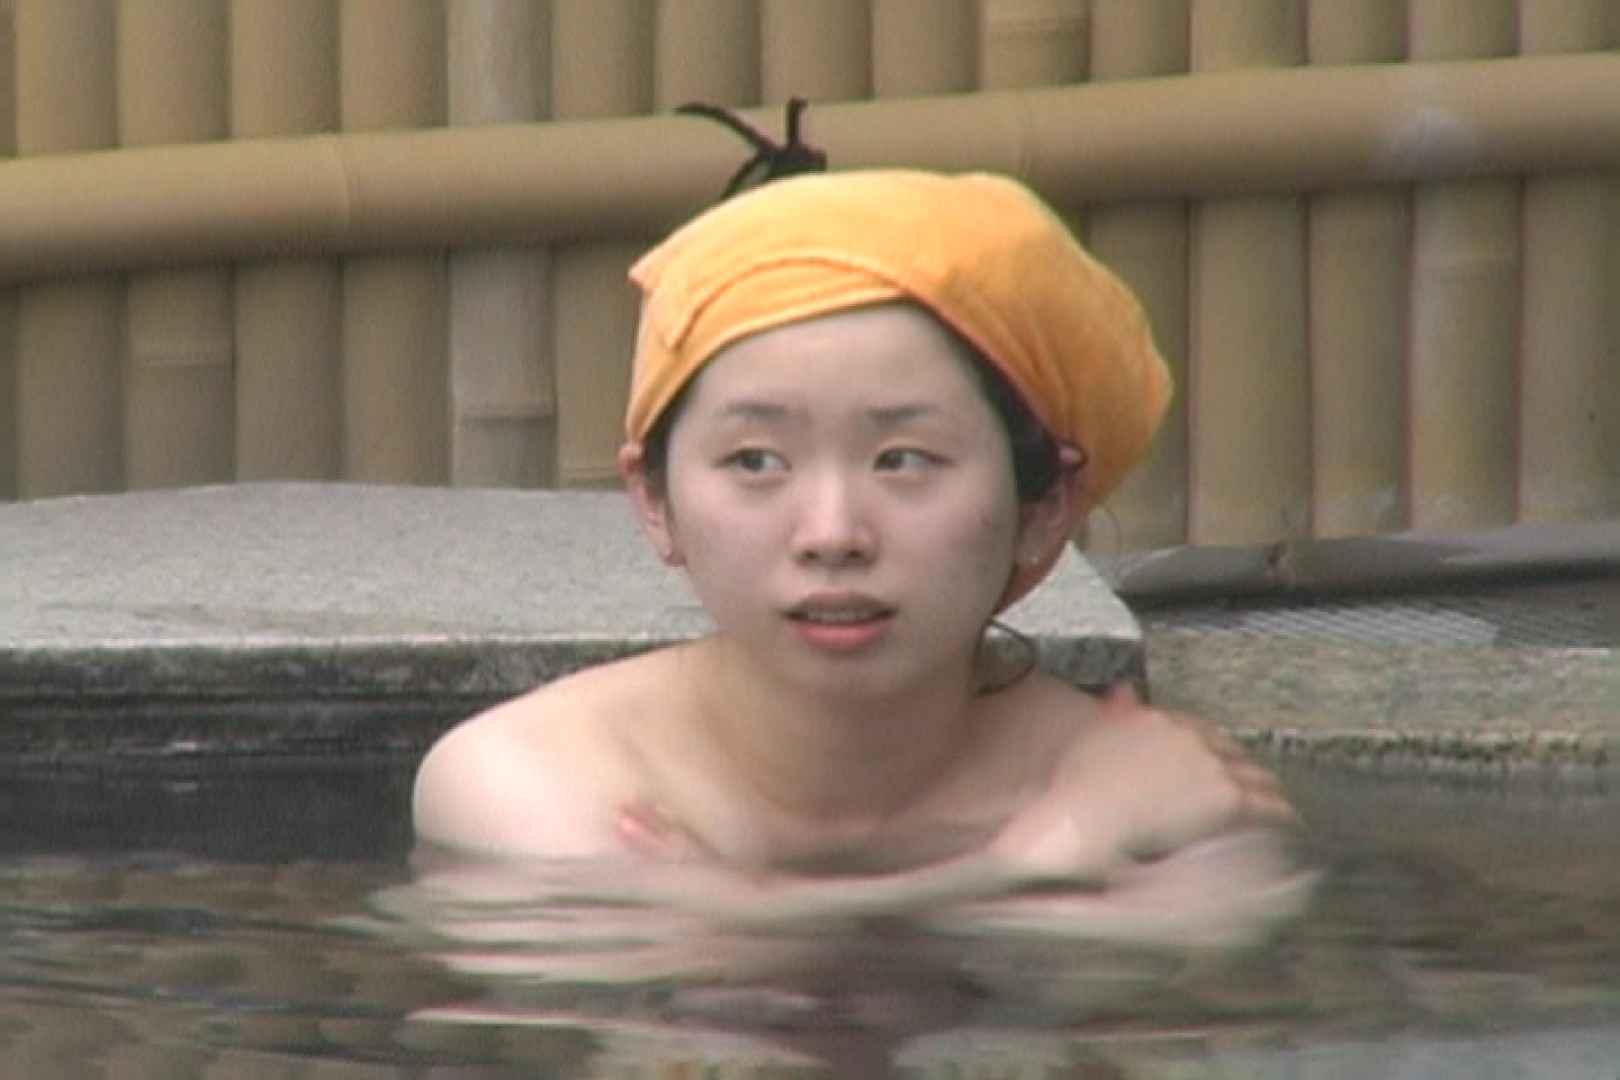 Aquaな露天風呂Vol.641 HなOL | 露天  50pic 22